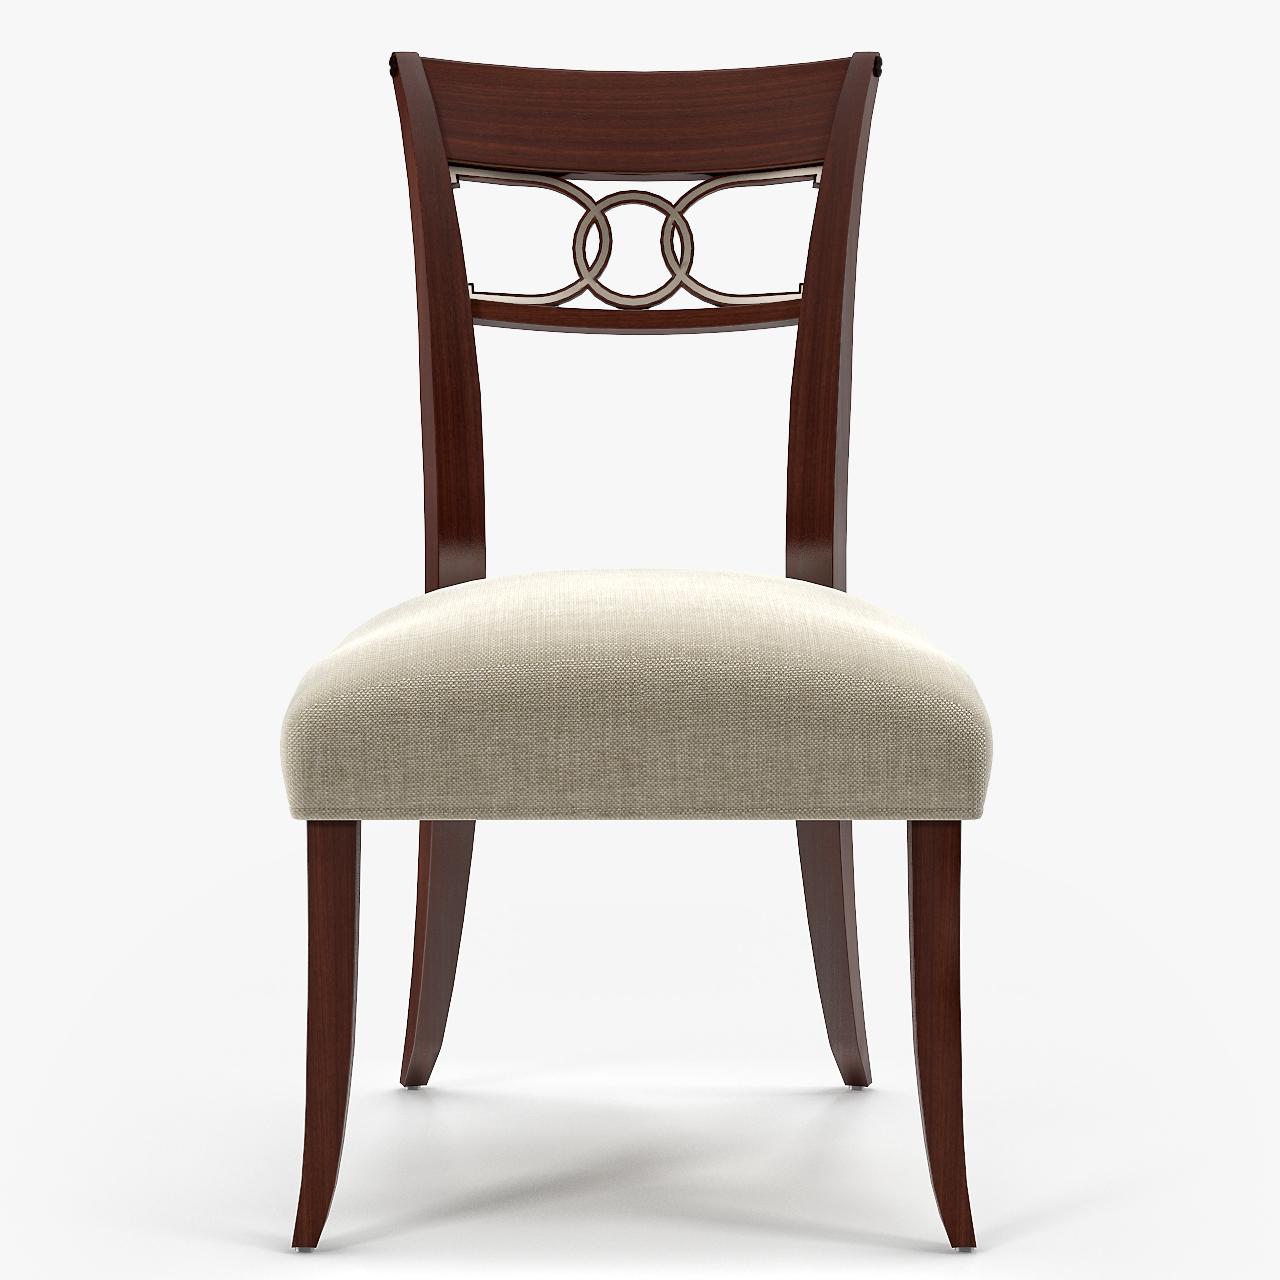 Peachy Baker Cleo Dining Side Chair Evergreenethics Interior Chair Design Evergreenethicsorg